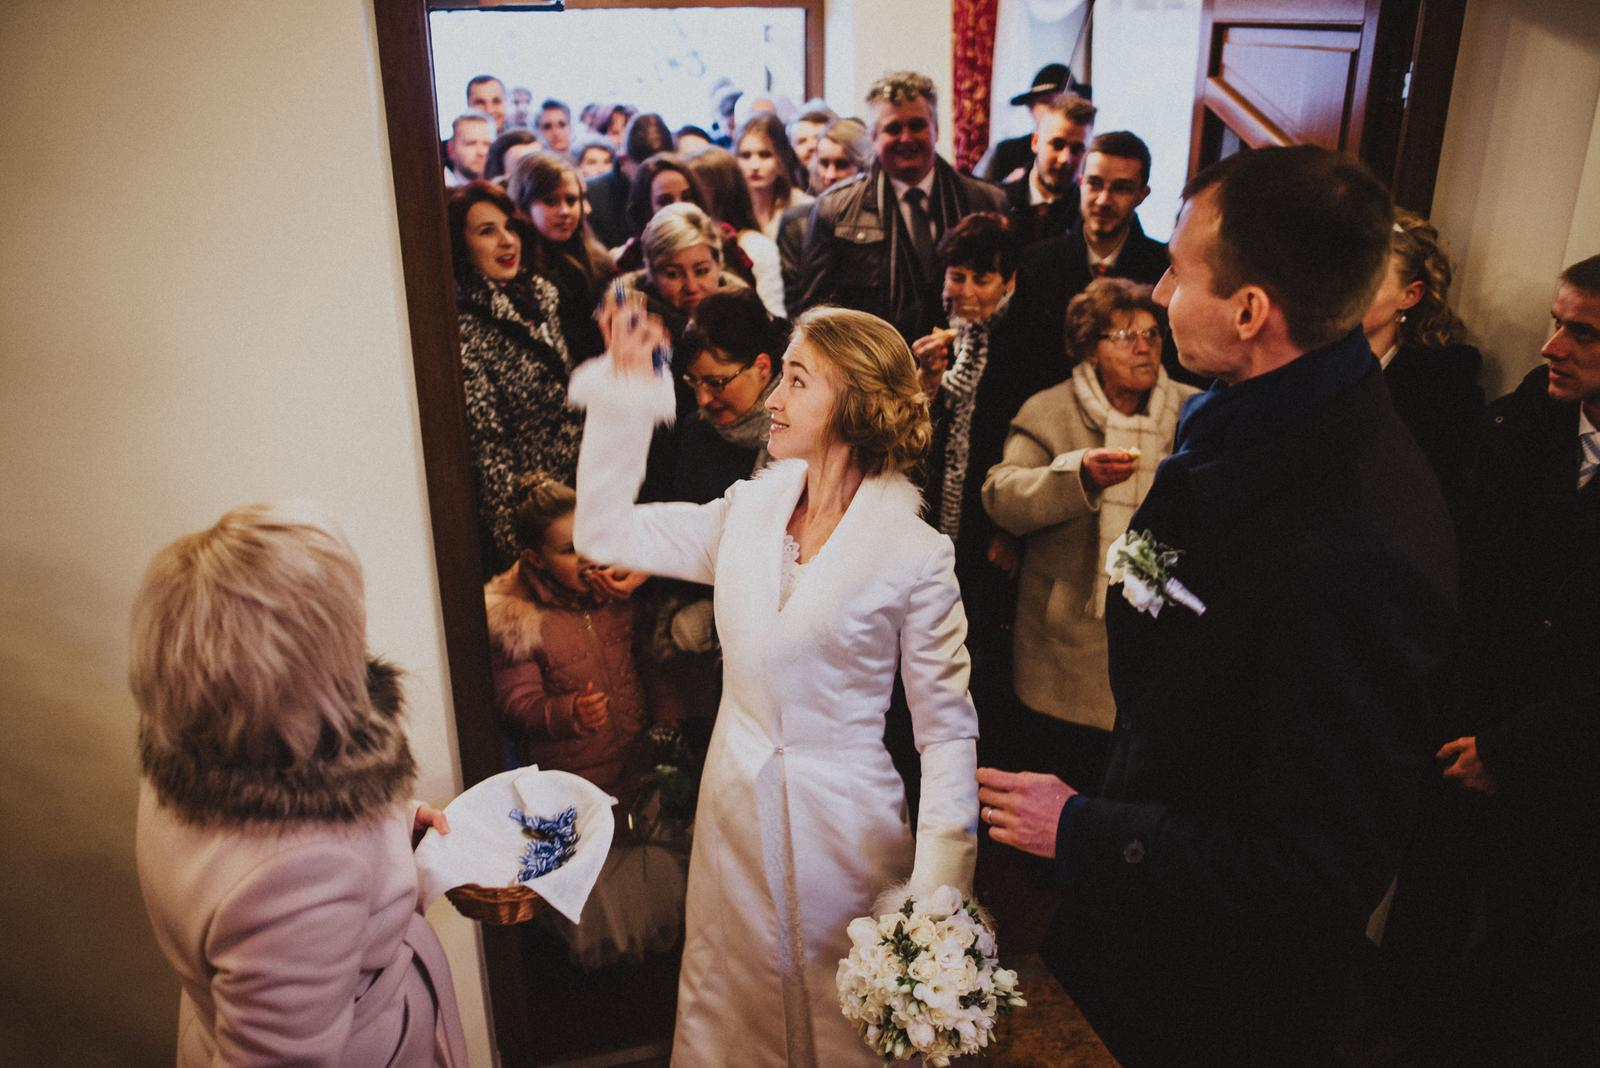 Tatranská zimná svadba - cukríky a vodka sa hádžu dozadu, kto chytí- ten má